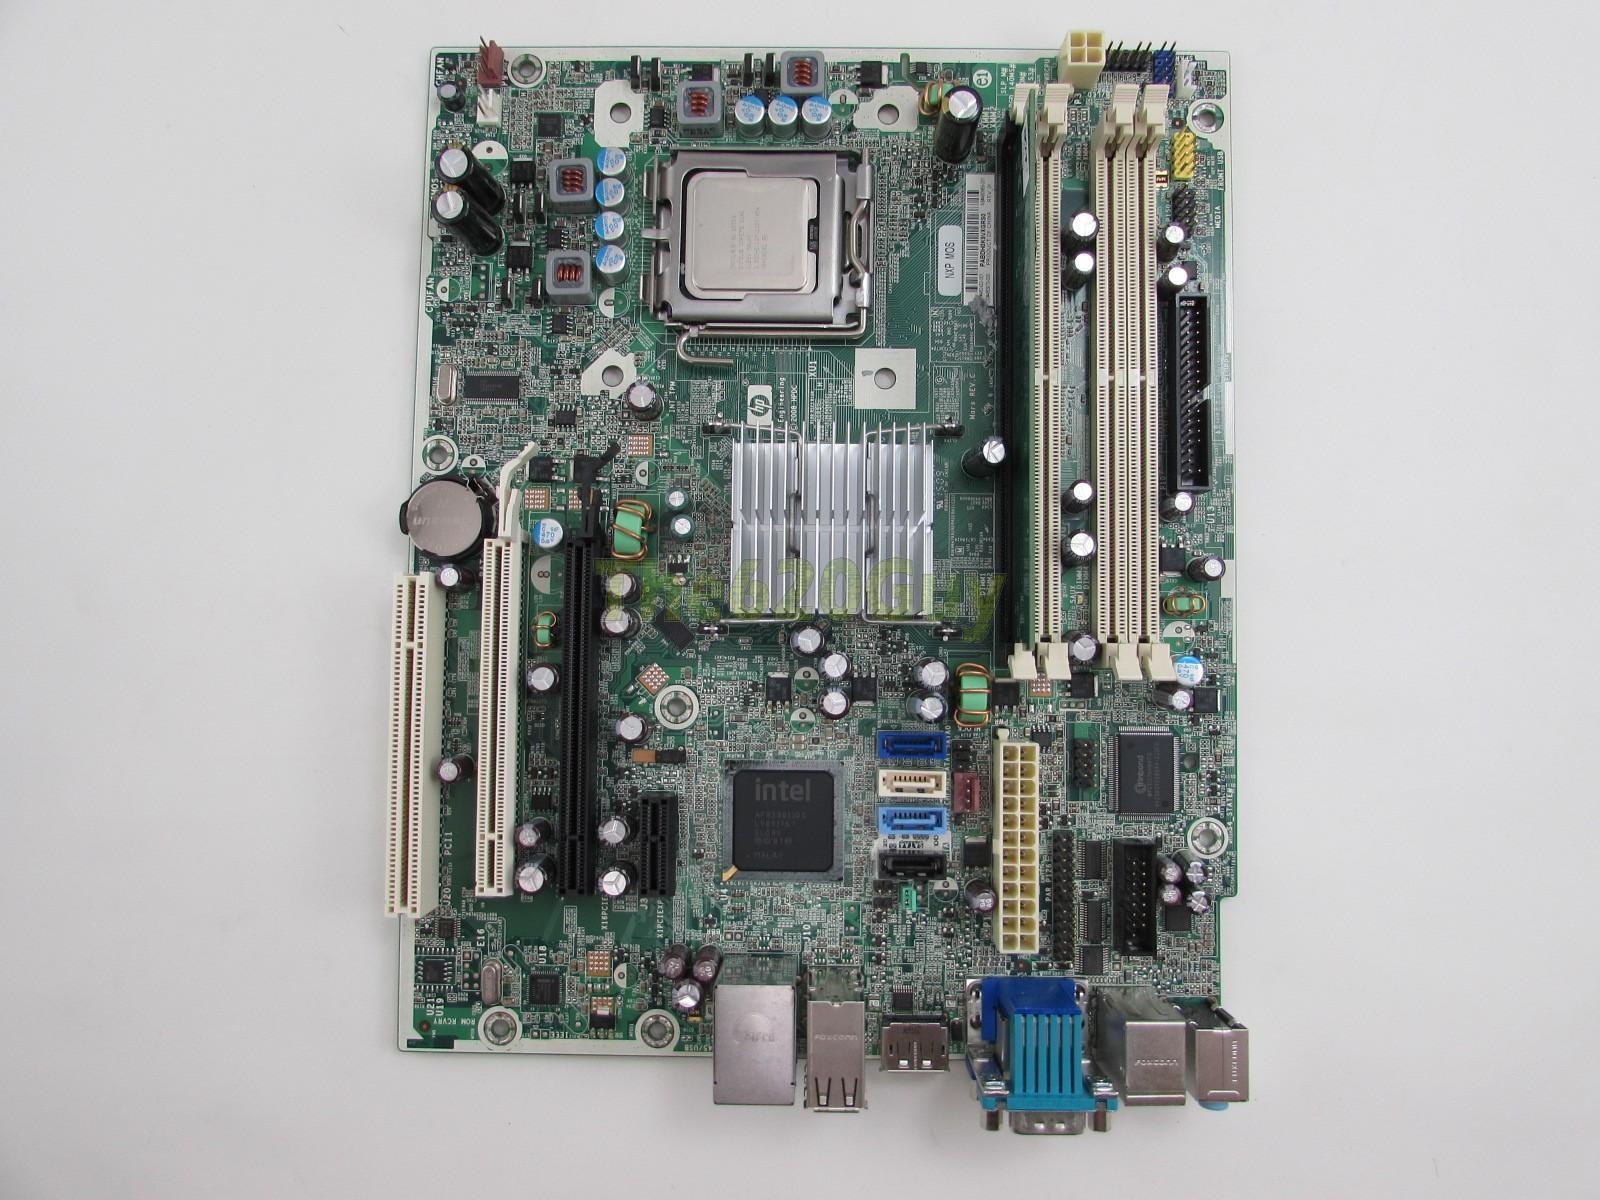 Détails : HP Compaq DC7900 Motherboard 462432-001 + Intel C2Q Q9550 2 83GHz  CPU + 1GB RAM